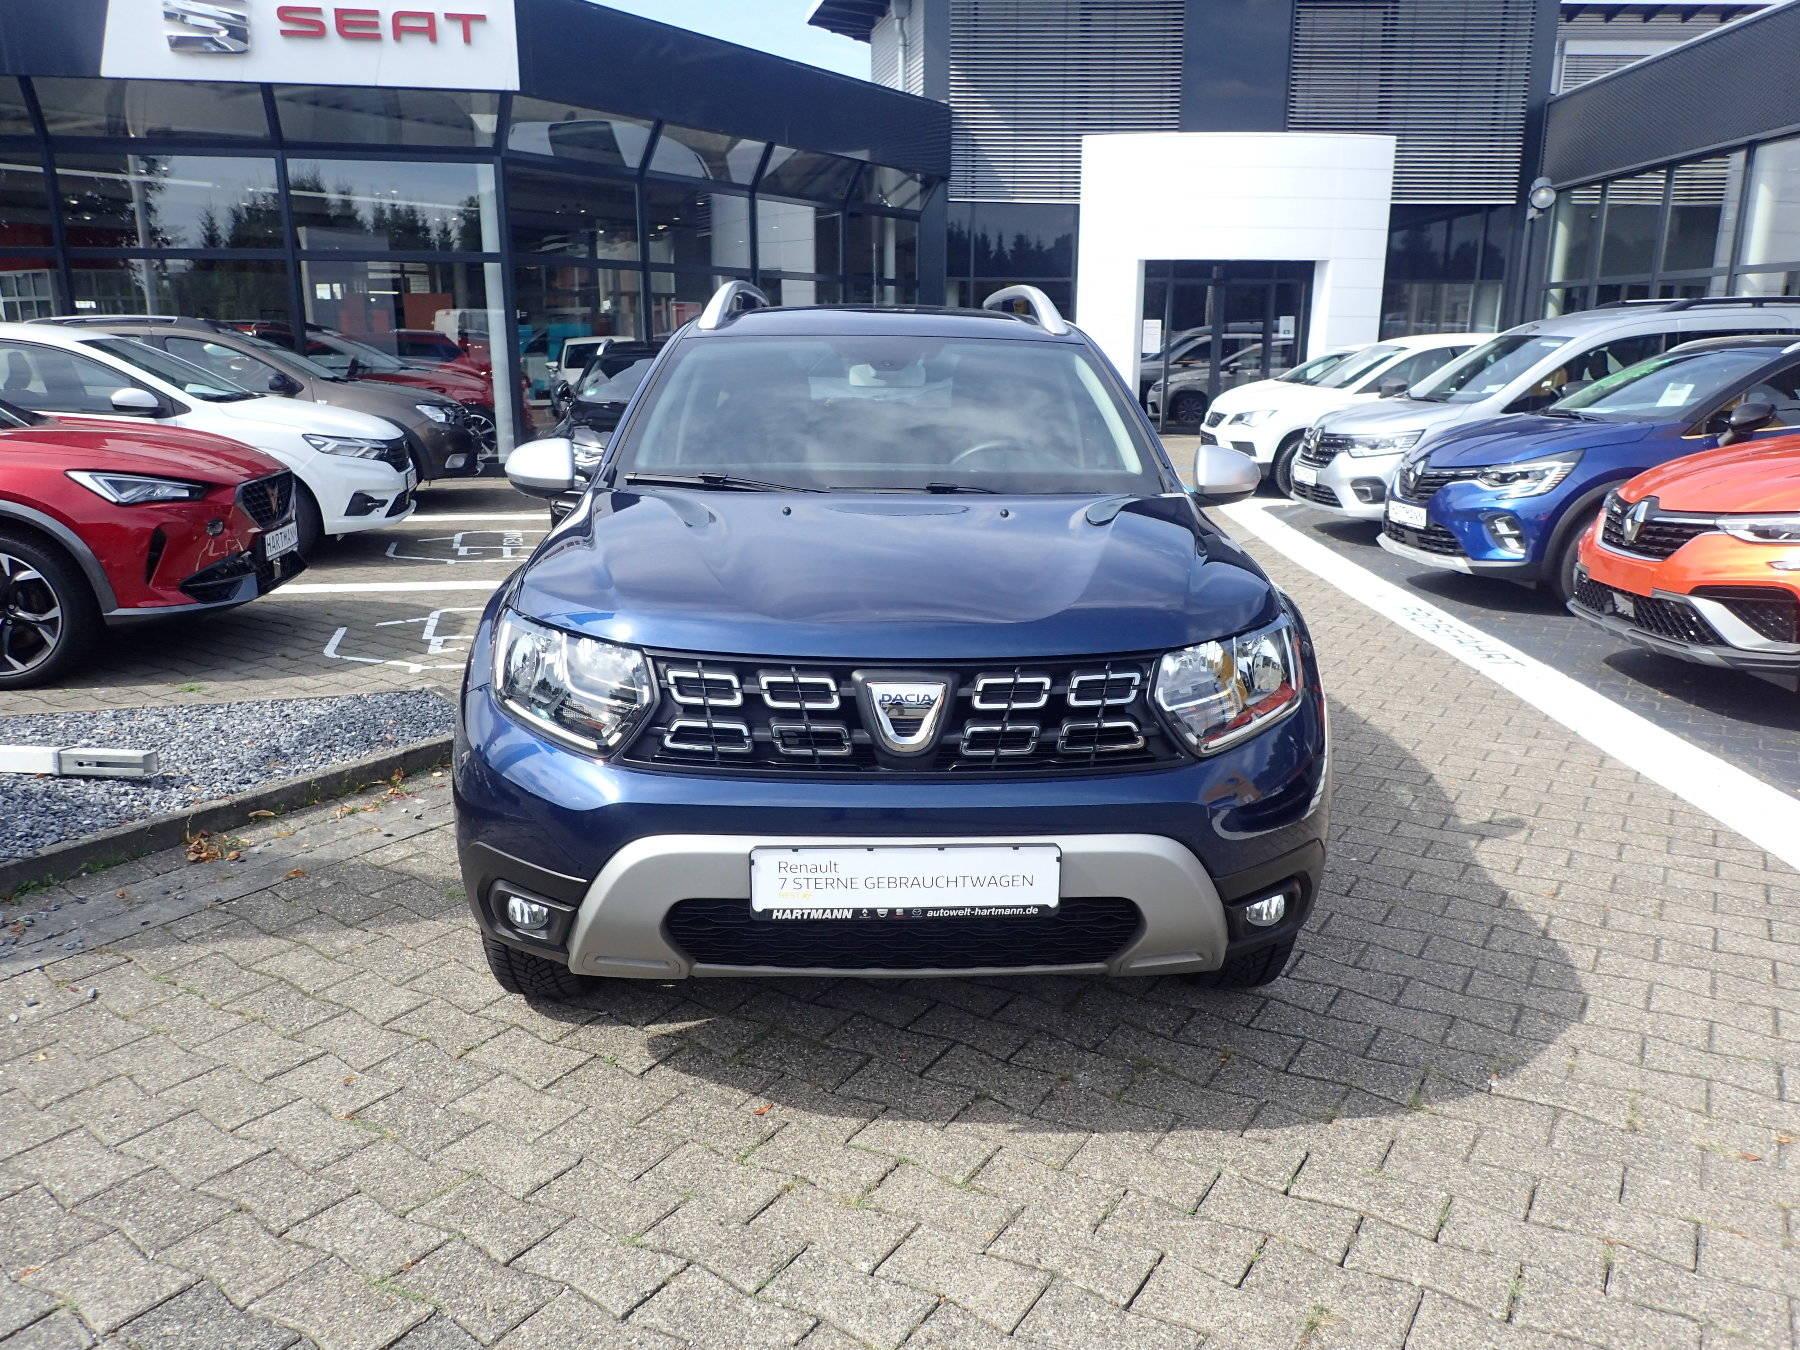 Dacia Duster Prestige SCe 115 2WD Technik-Paket, Jahr 2018, Benzin